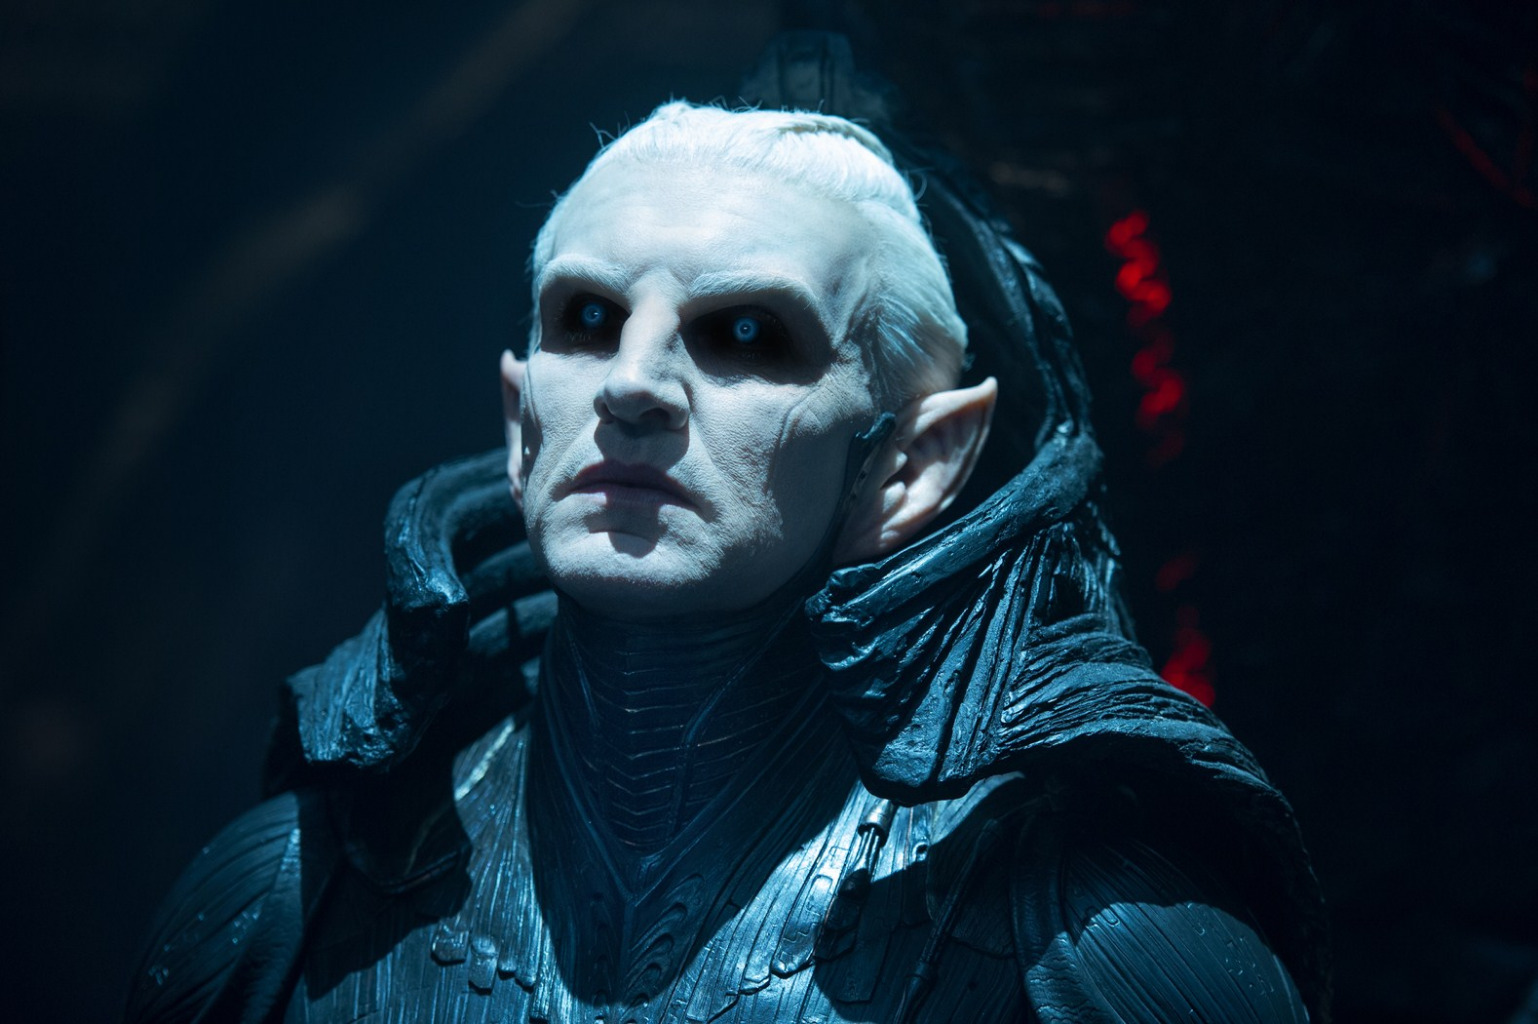 Dunkelelf Malekith (Christopher Eccleston) schaut finster